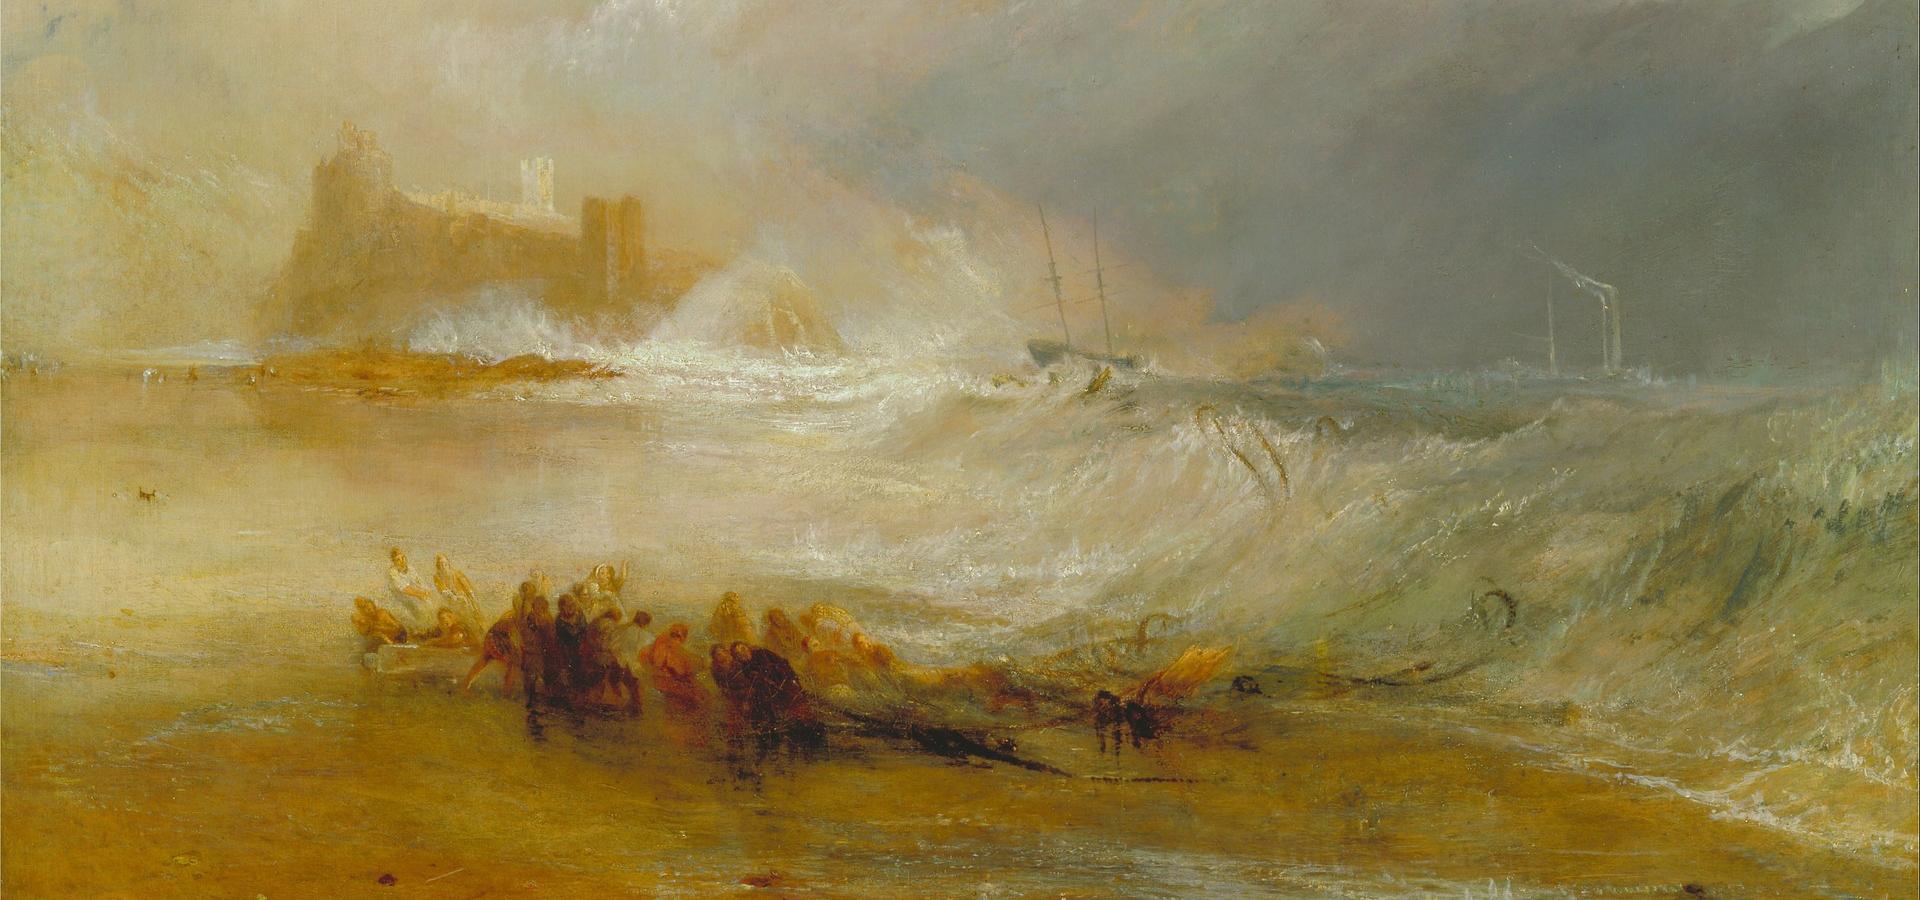 пейзаж Мародёры - морское побережье Нортамберленда :: Уильям Тёрнер - William Turner фото